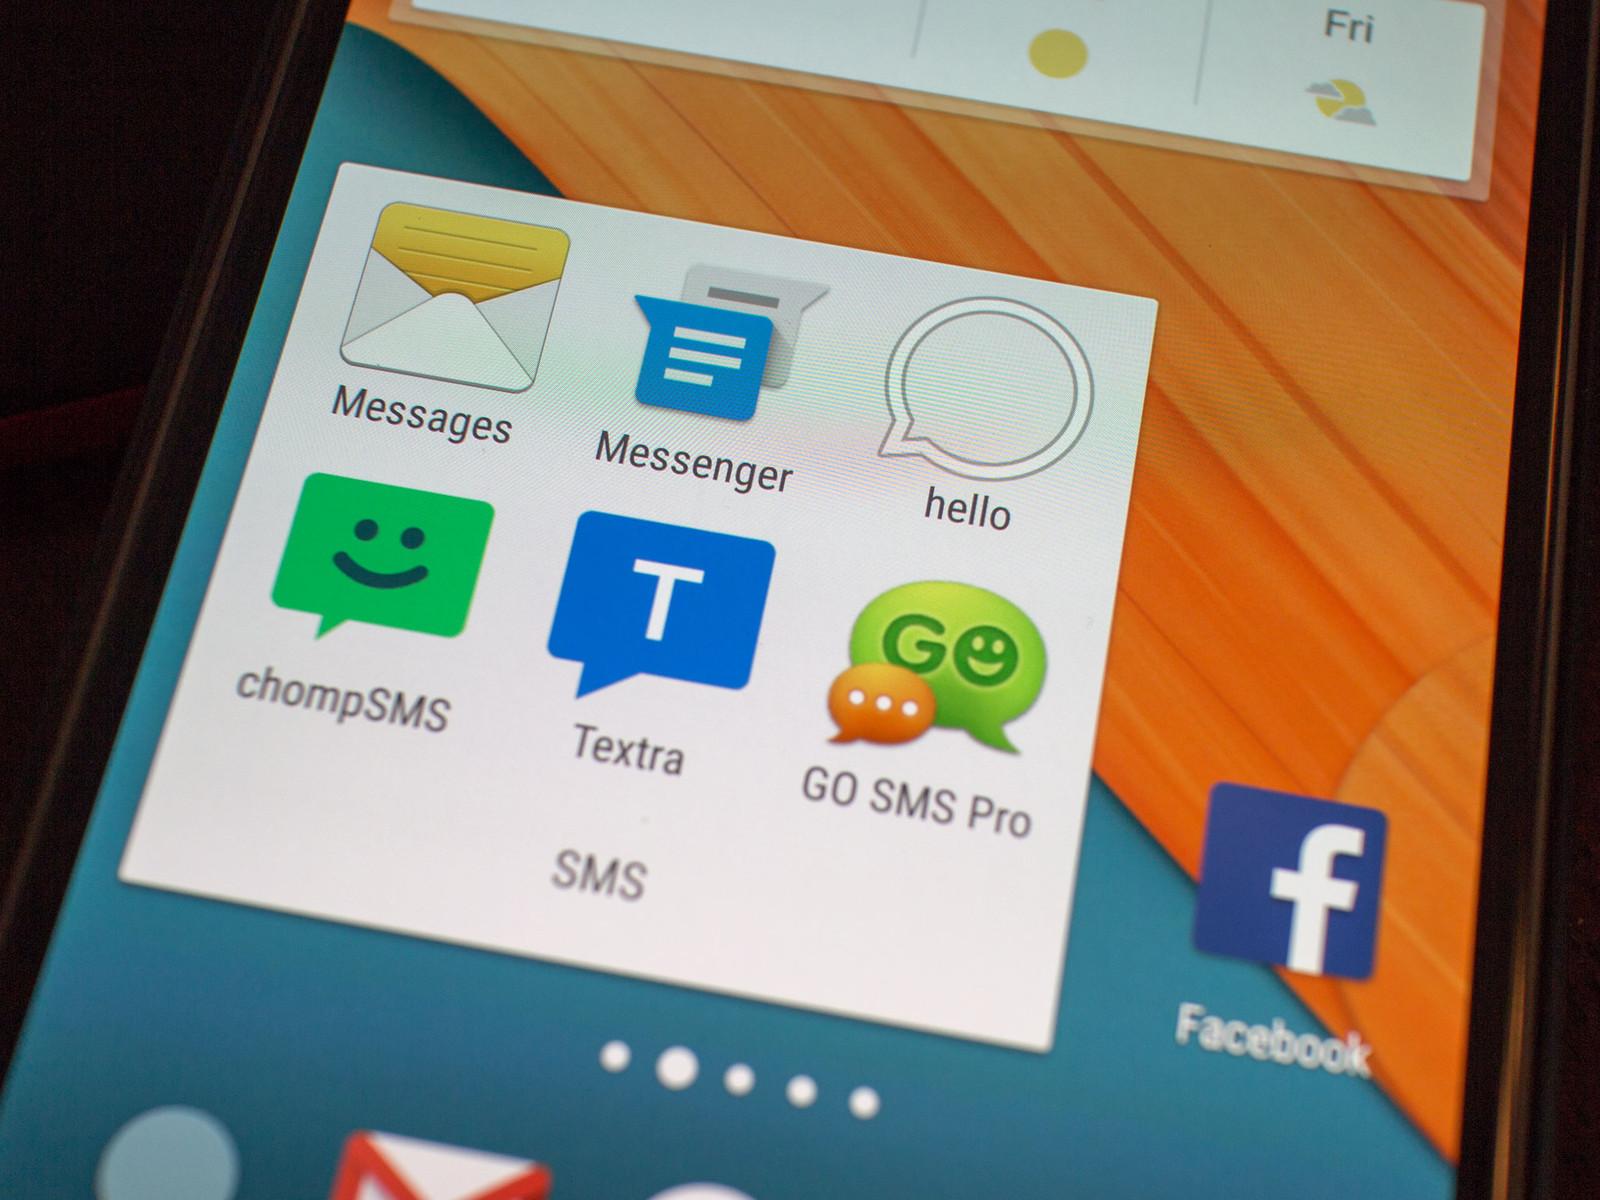 Samsung Google RCS